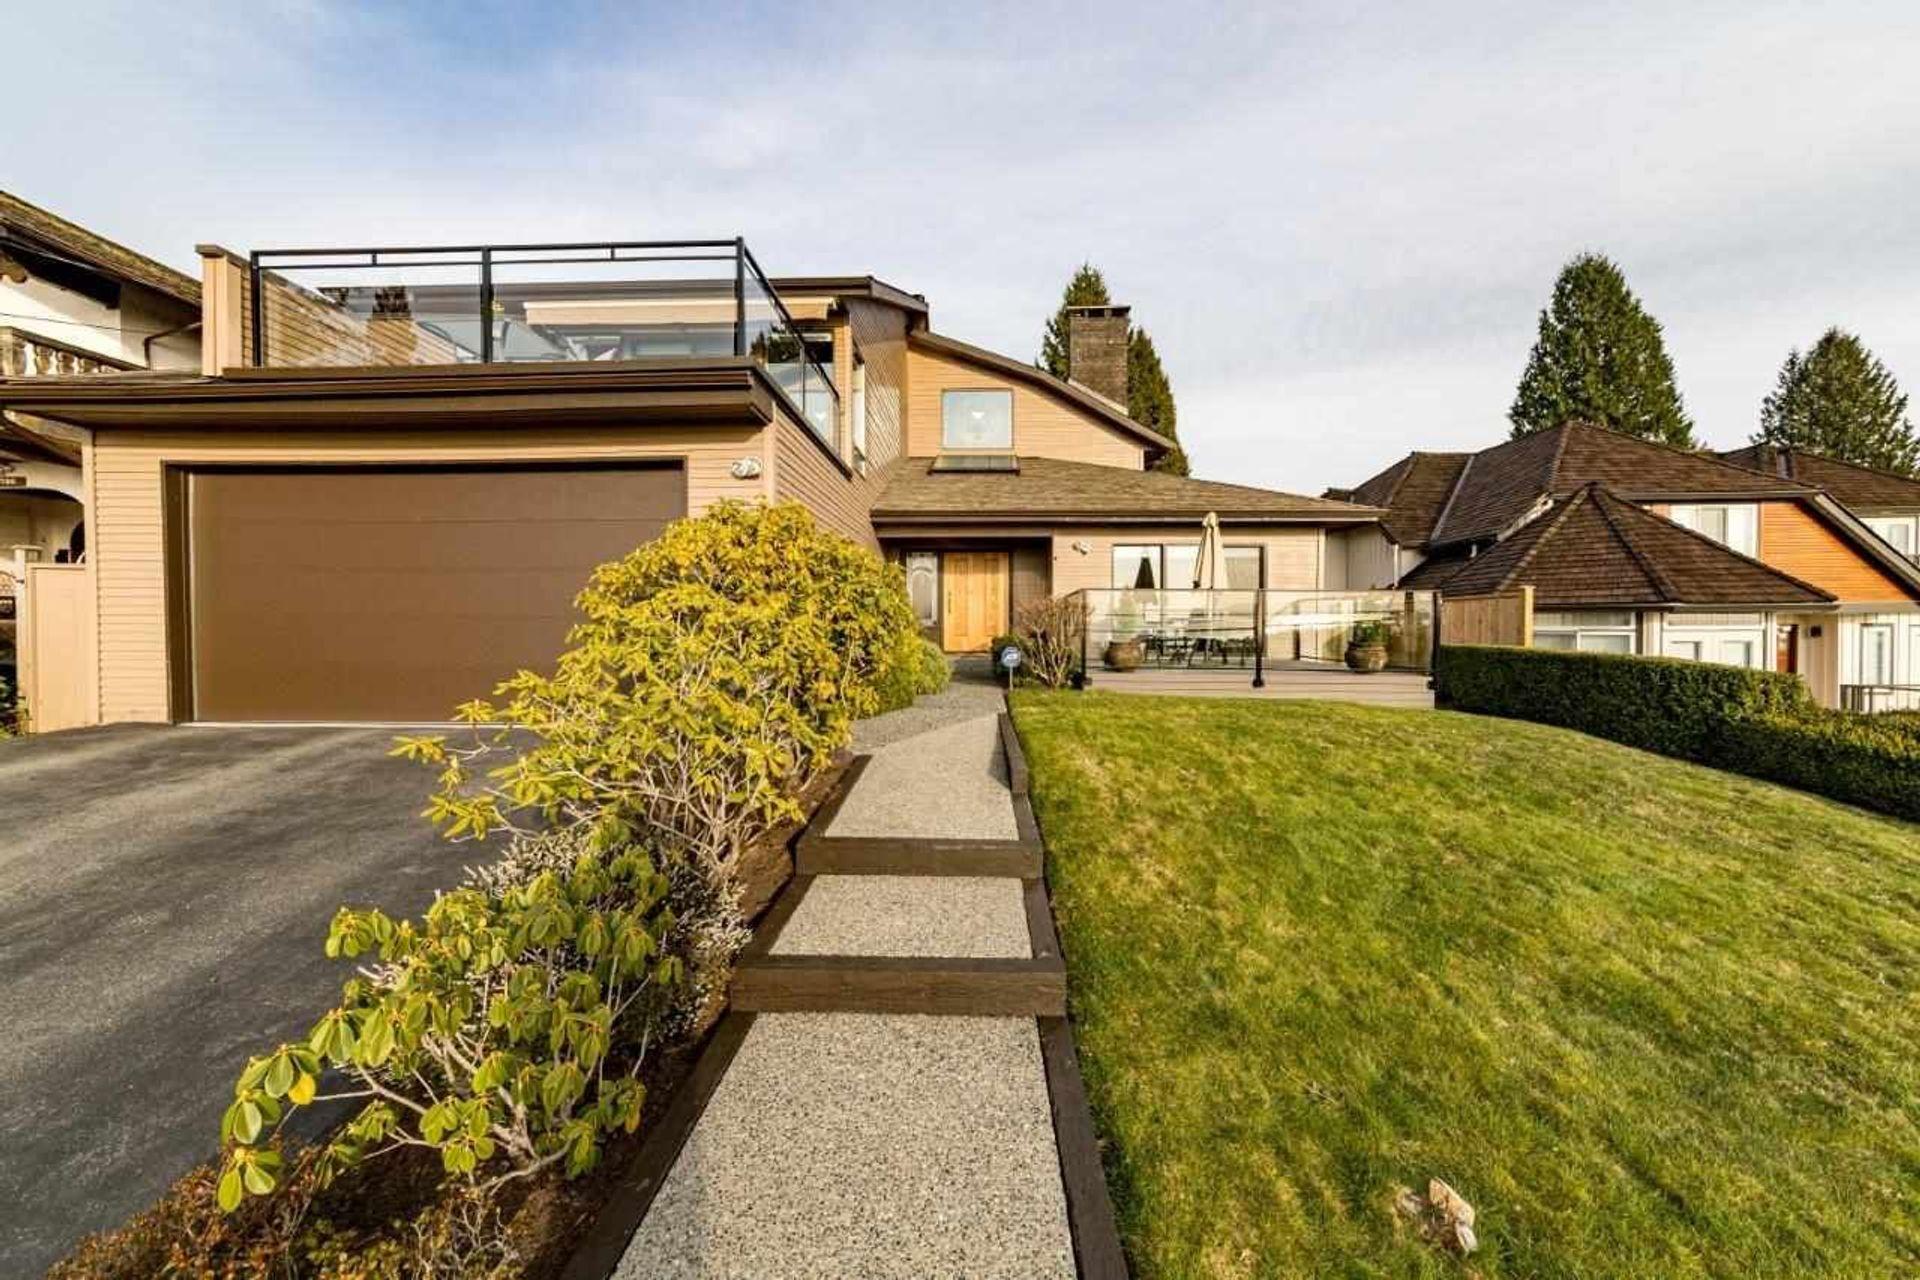 3760-st-pauls-avenue-upper-lonsdale-north-vancouver-35 at 3760 St. Pauls Avenue, Upper Lonsdale, North Vancouver